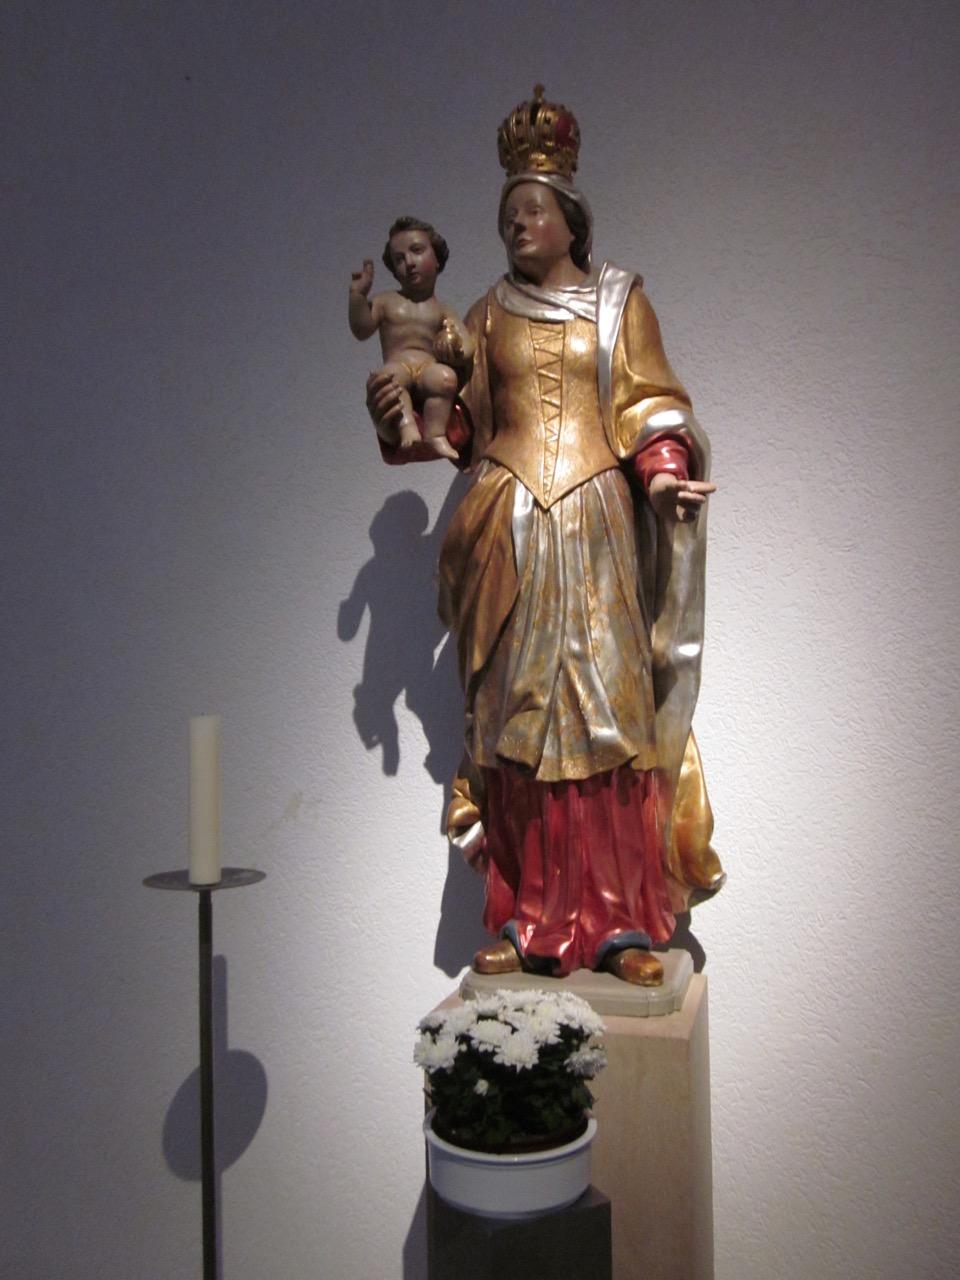 Mutter-Gottes-Statue (18. Jh.)